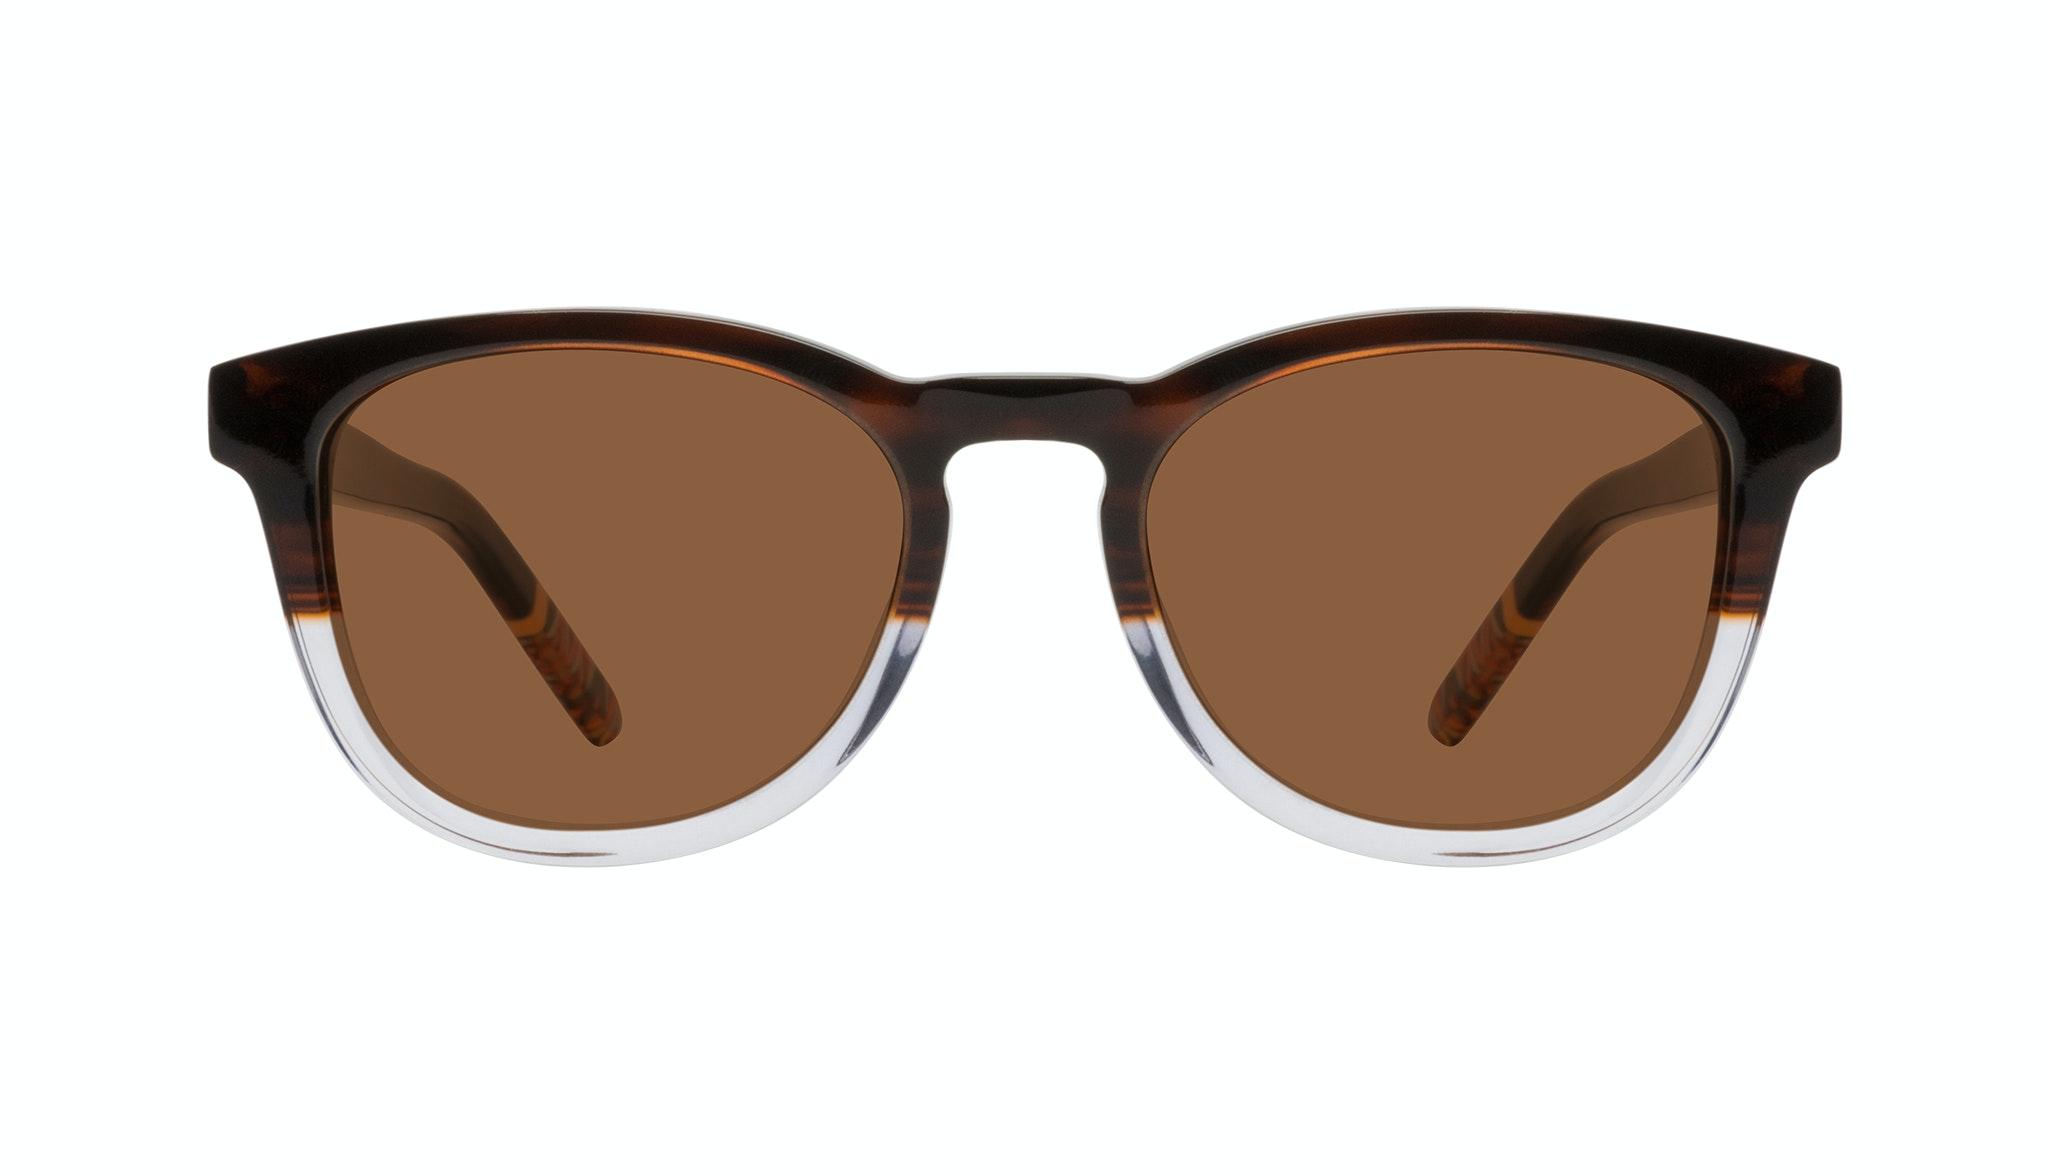 Affordable Fashion Glasses Round Sunglasses Men Goal Bark Front